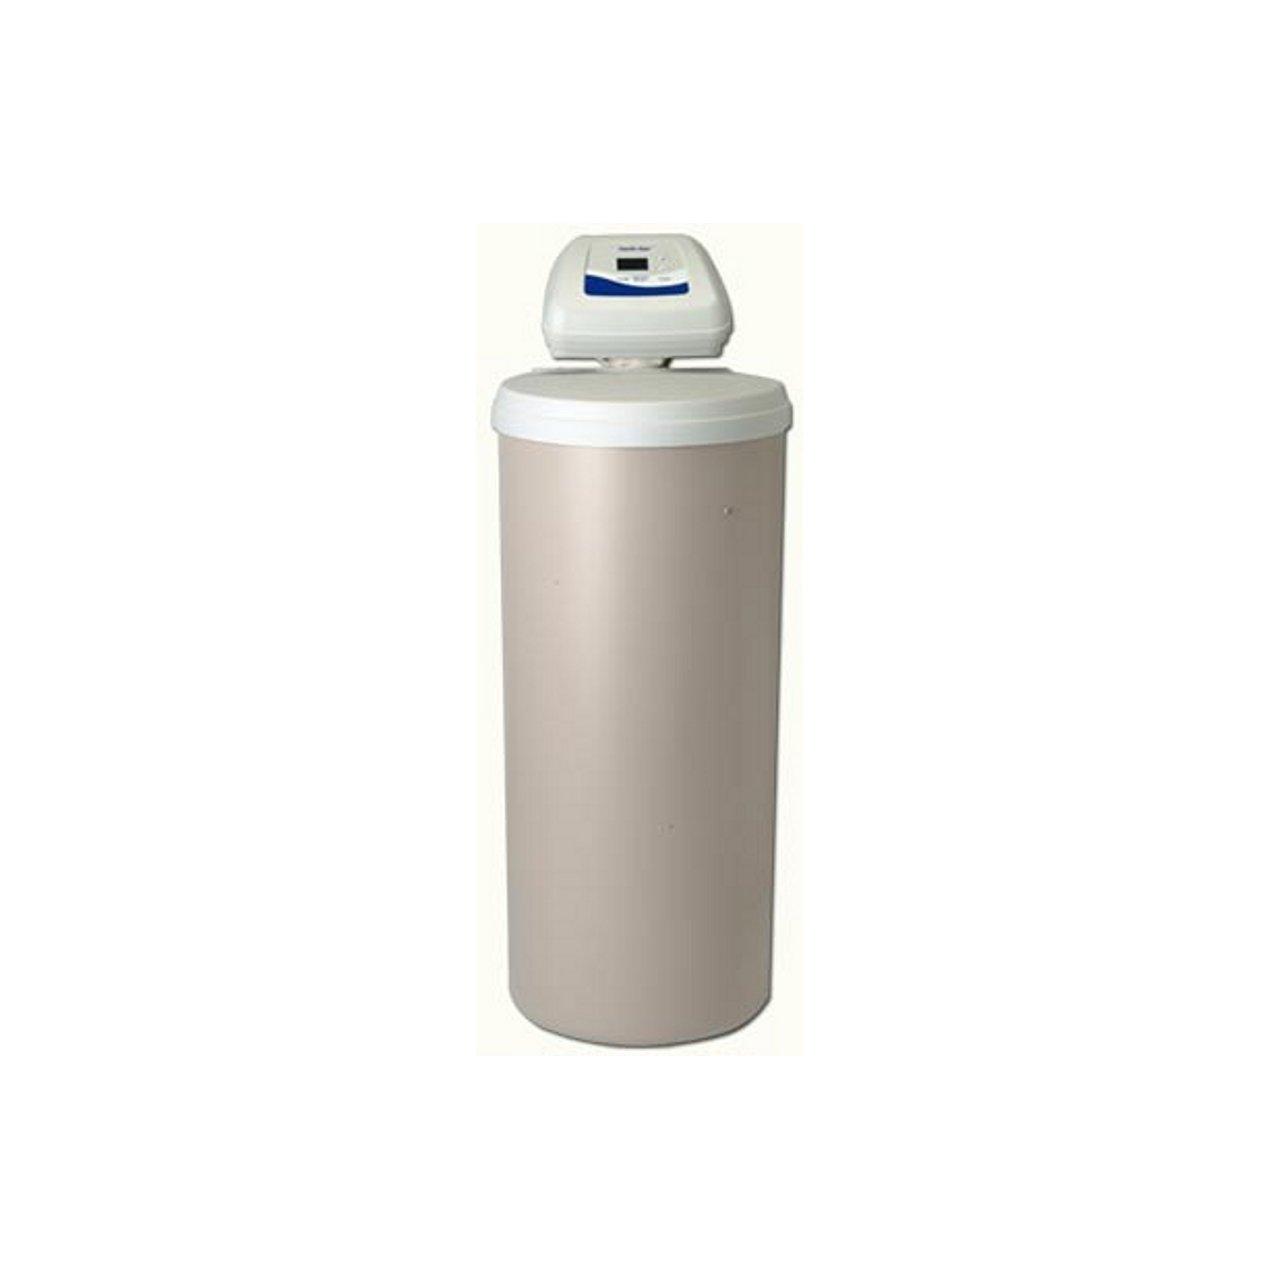 Image Result For Saltless Water Softener Reviews